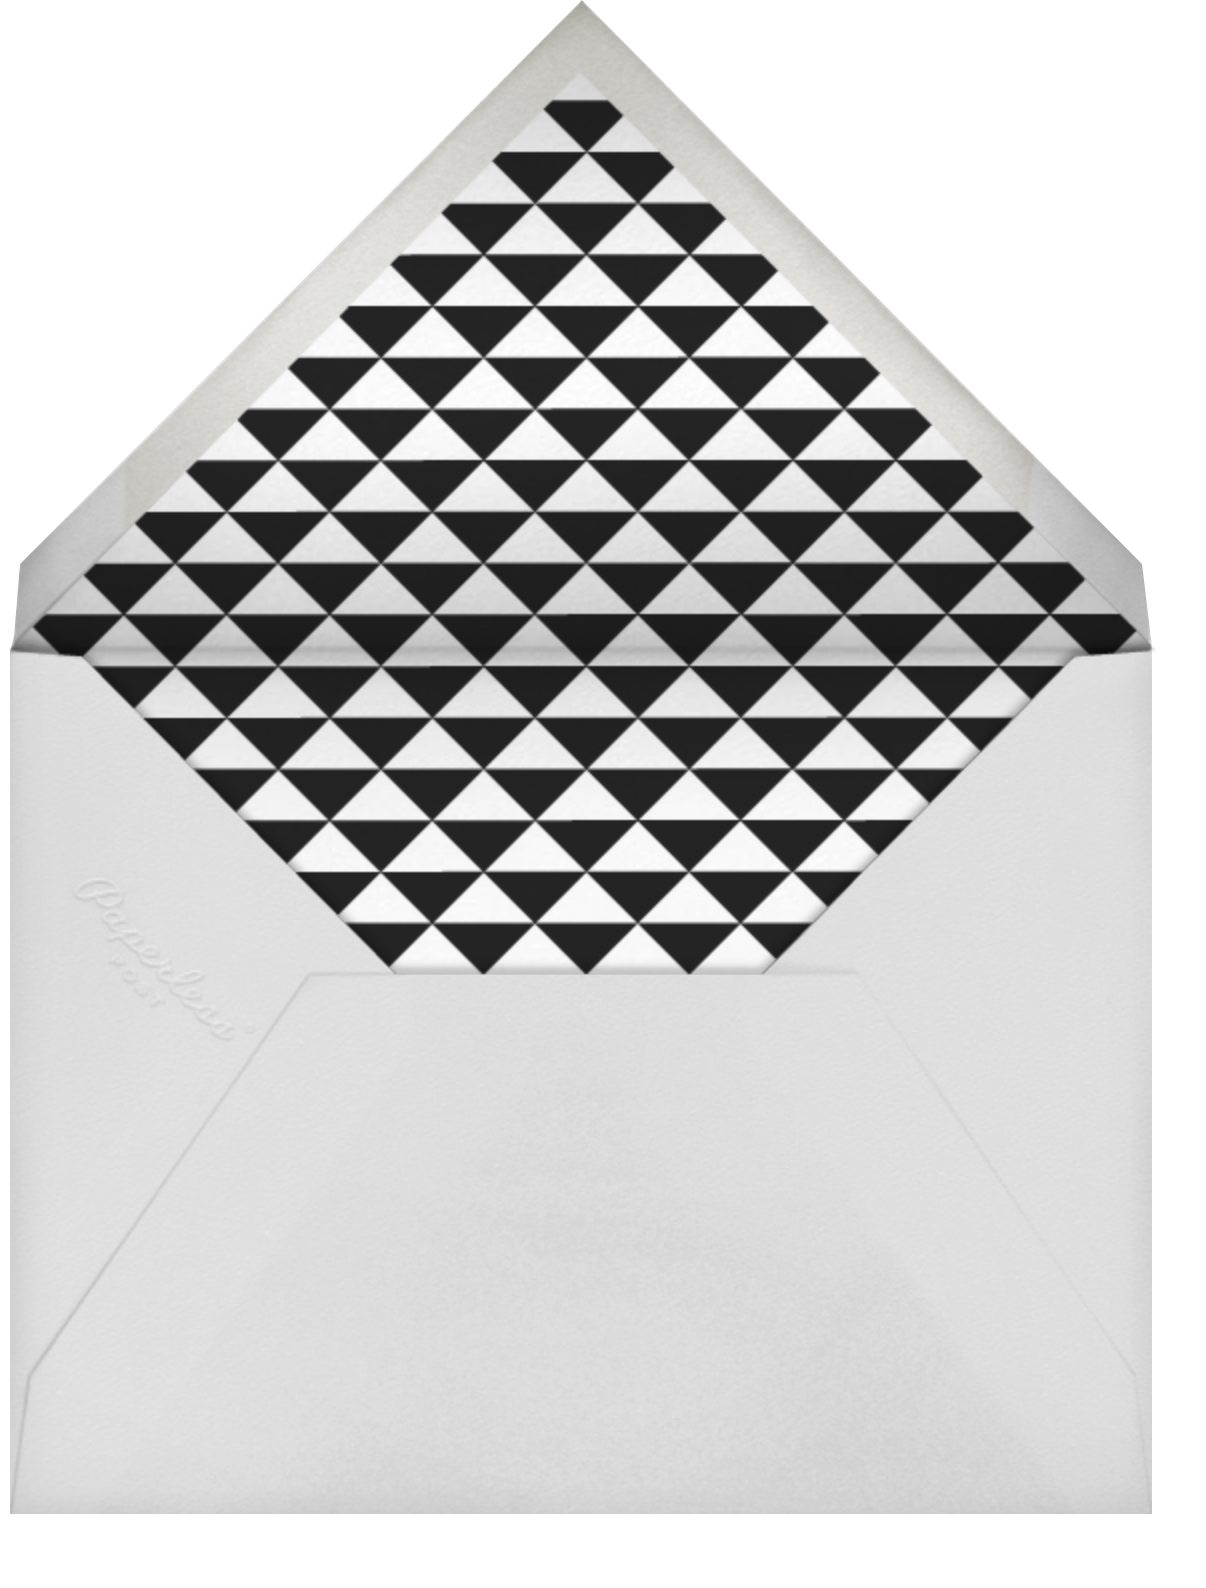 Painted Circle - Rose Gold - Paperless Post - General entertaining - envelope back